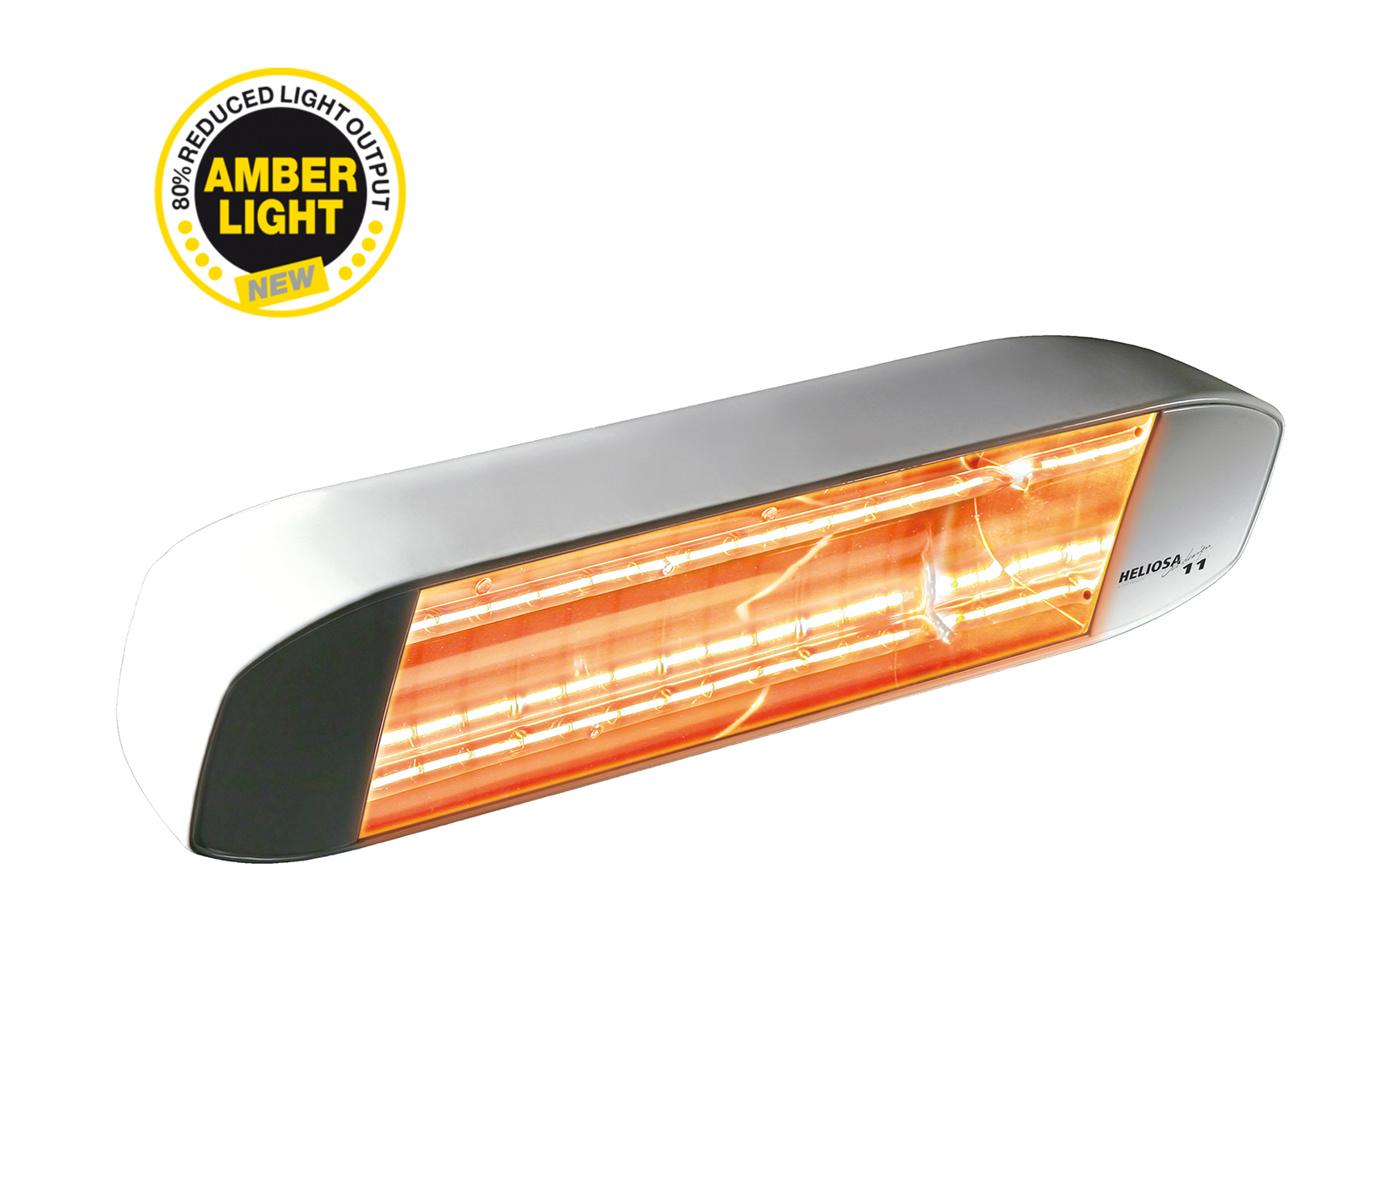 HELIOSA 11 - Amber Light